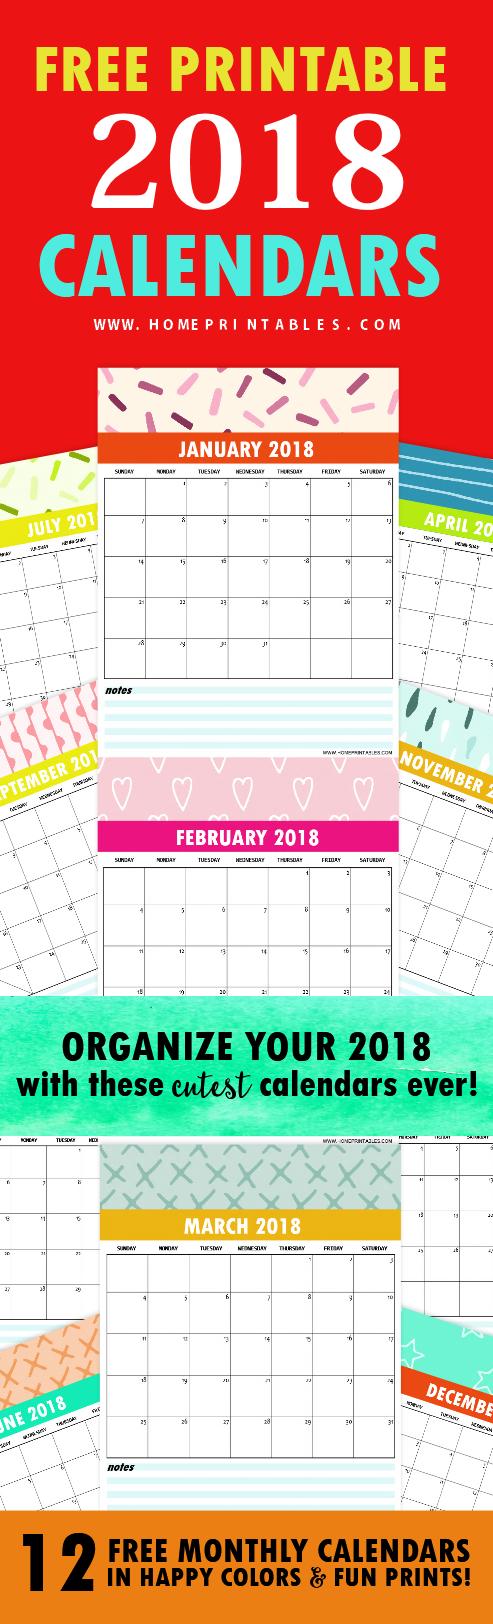 Free Calendar 2018: Fun Colors in Really Cute Prints ...